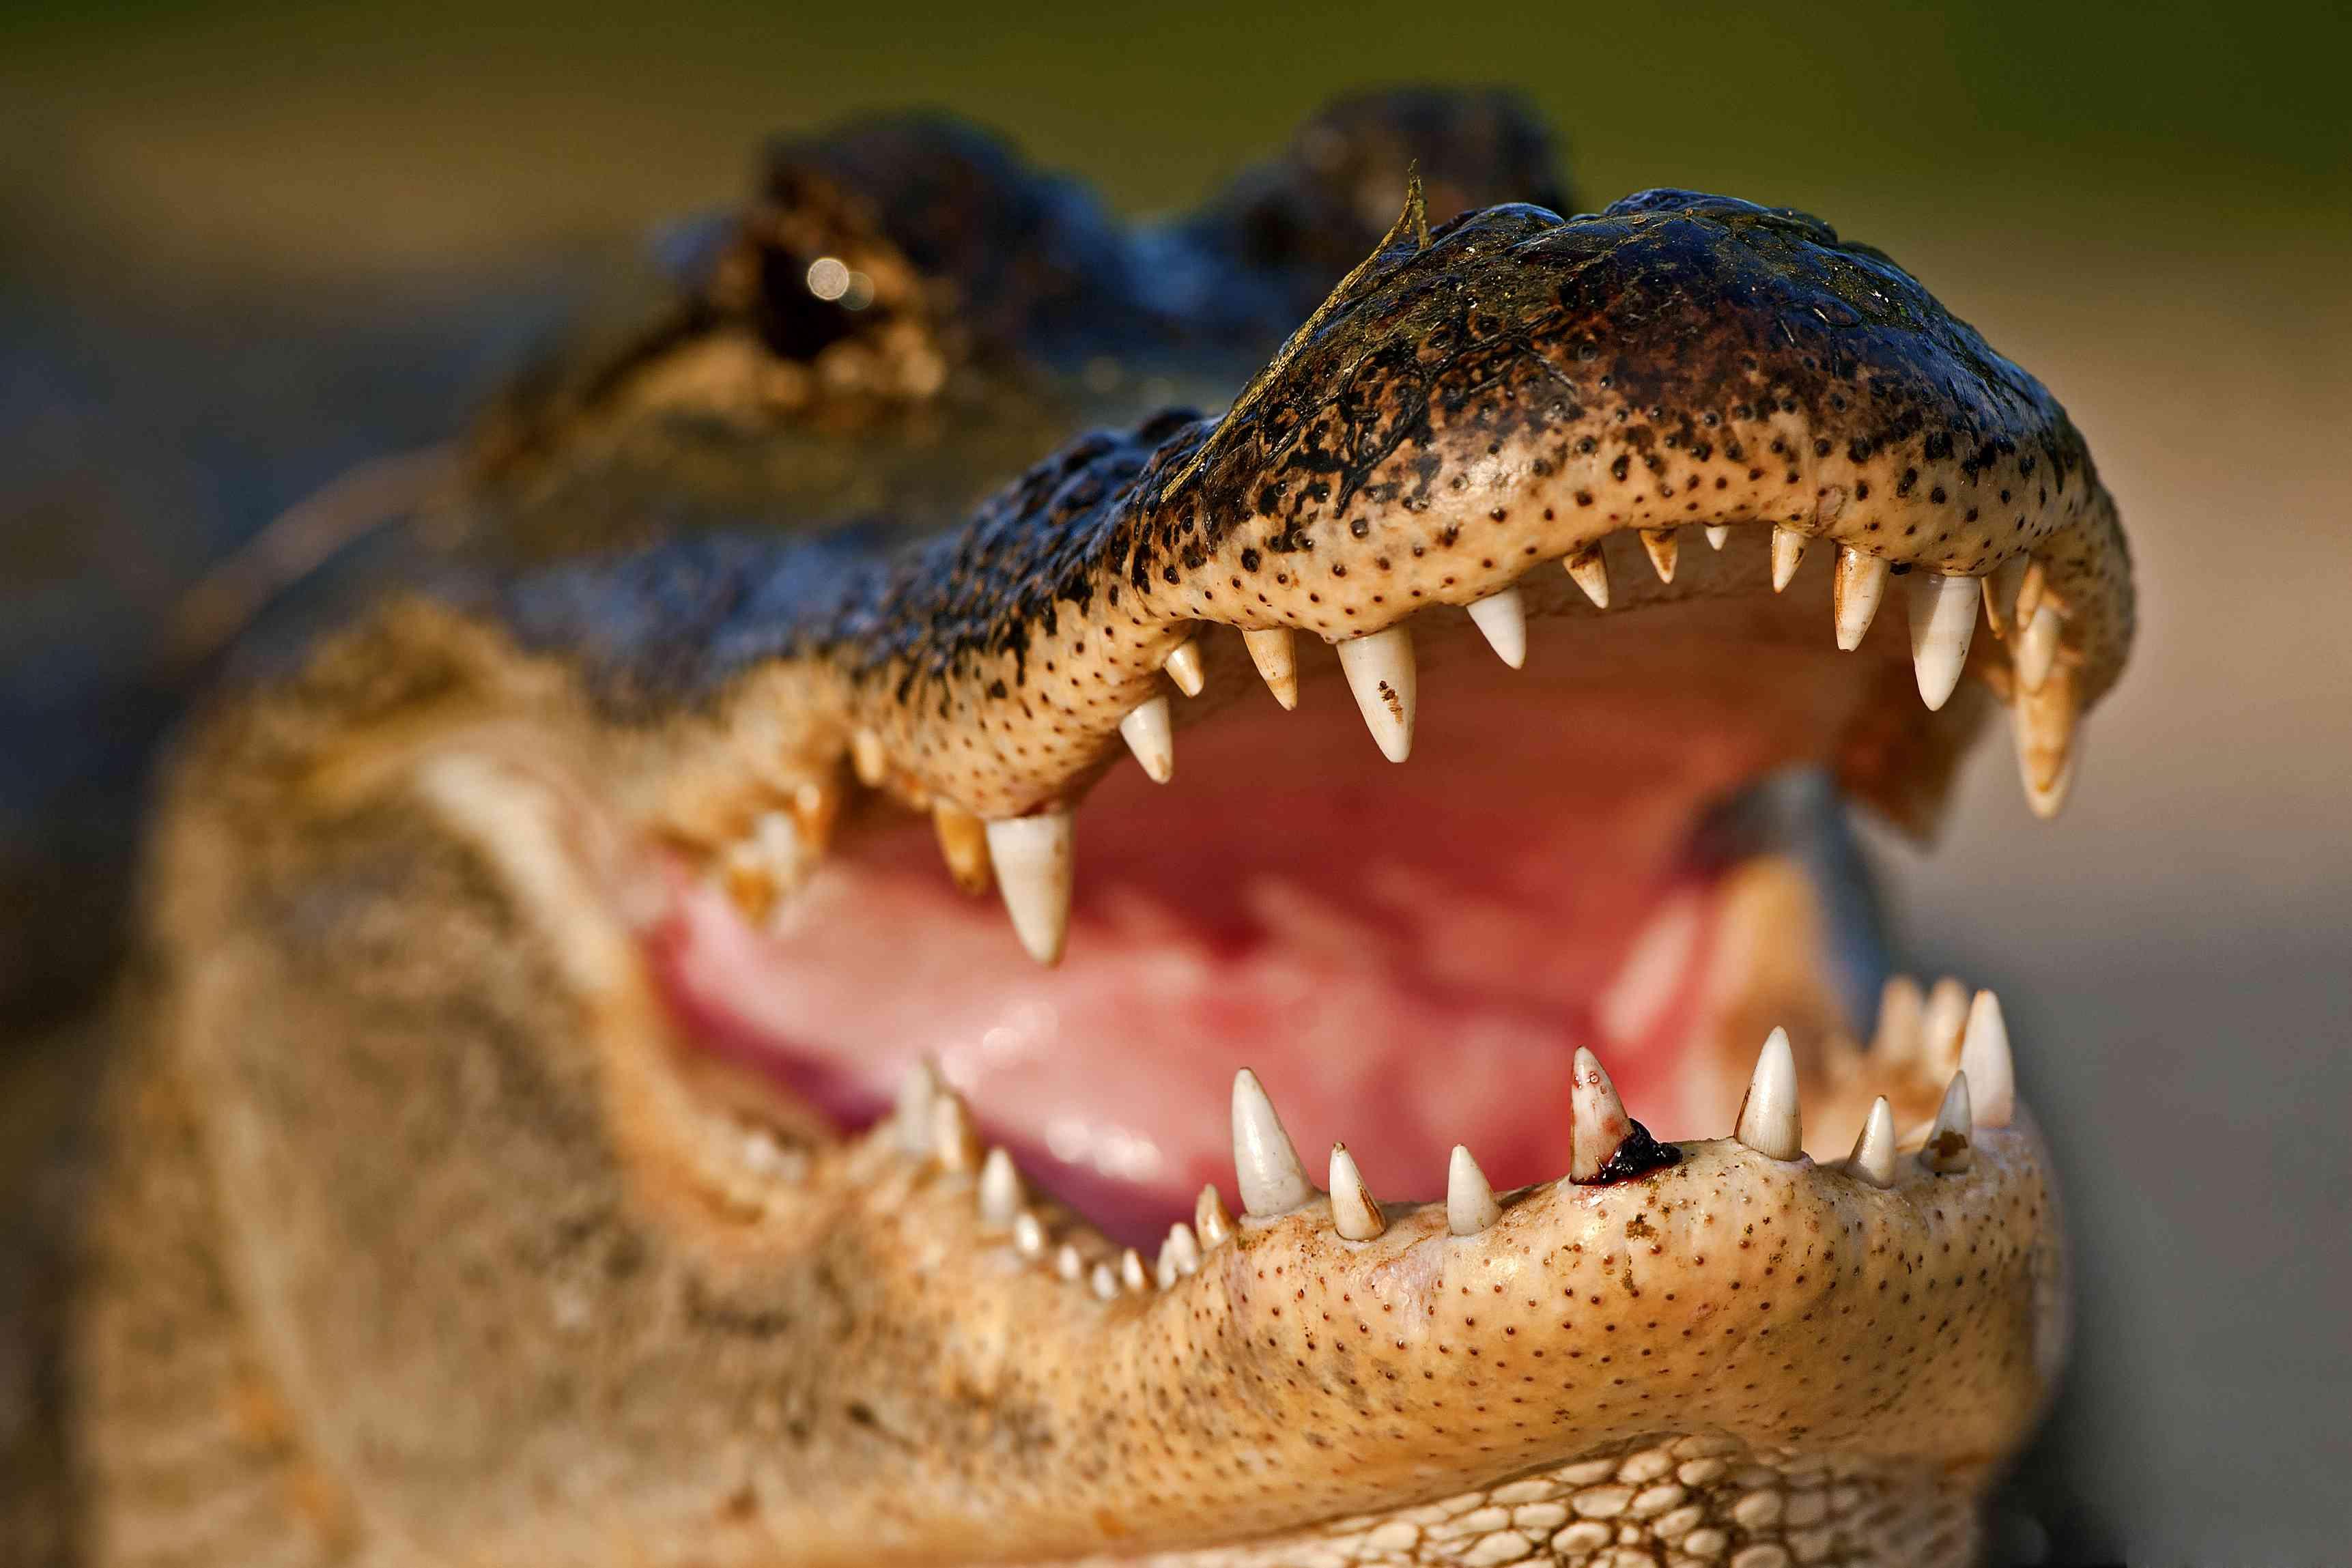 American alligator showing its teeth